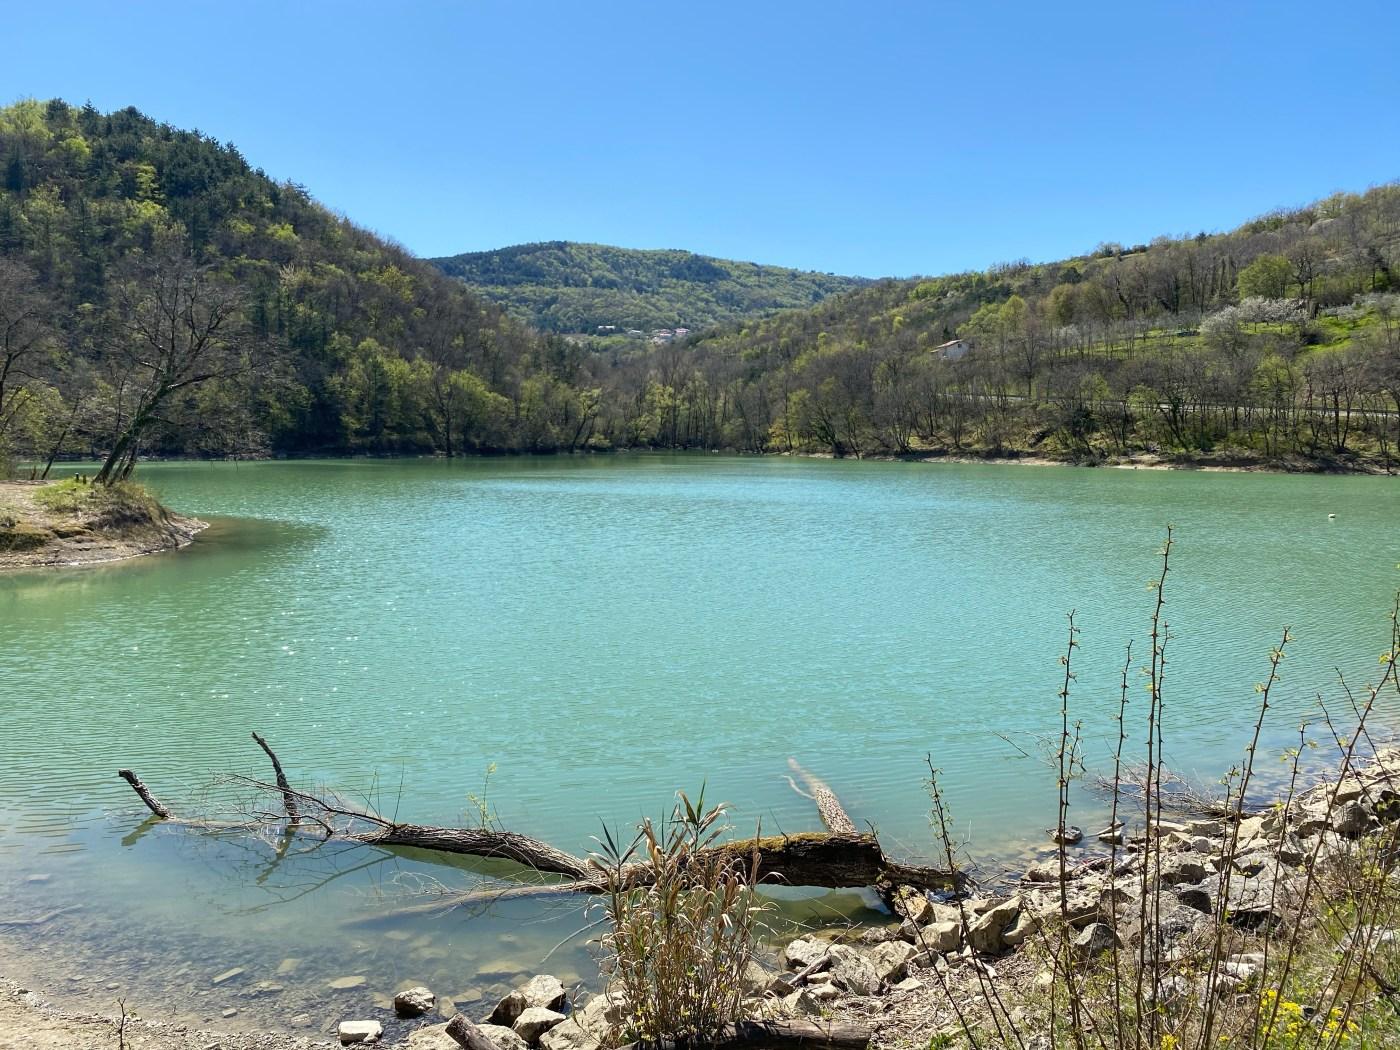 Vanganel lake